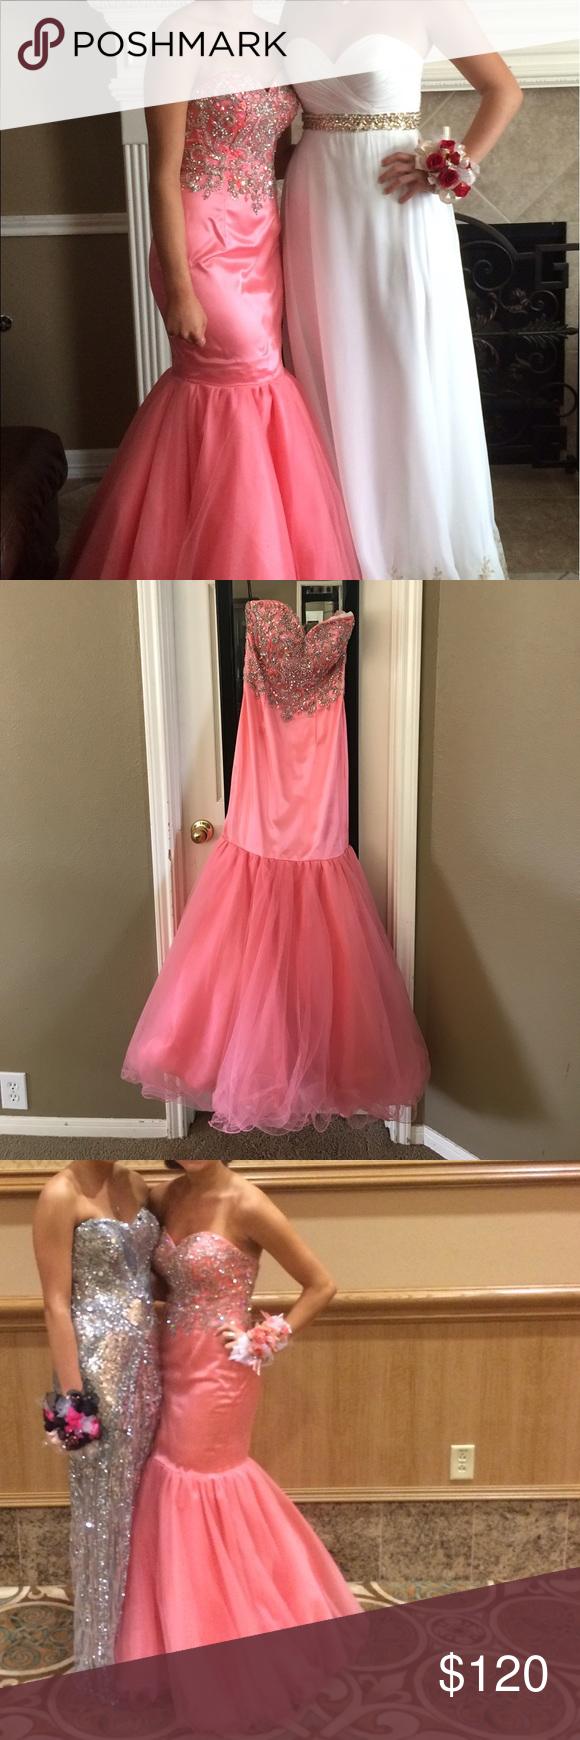 Coral prom dress disney dresses dress prom and prom